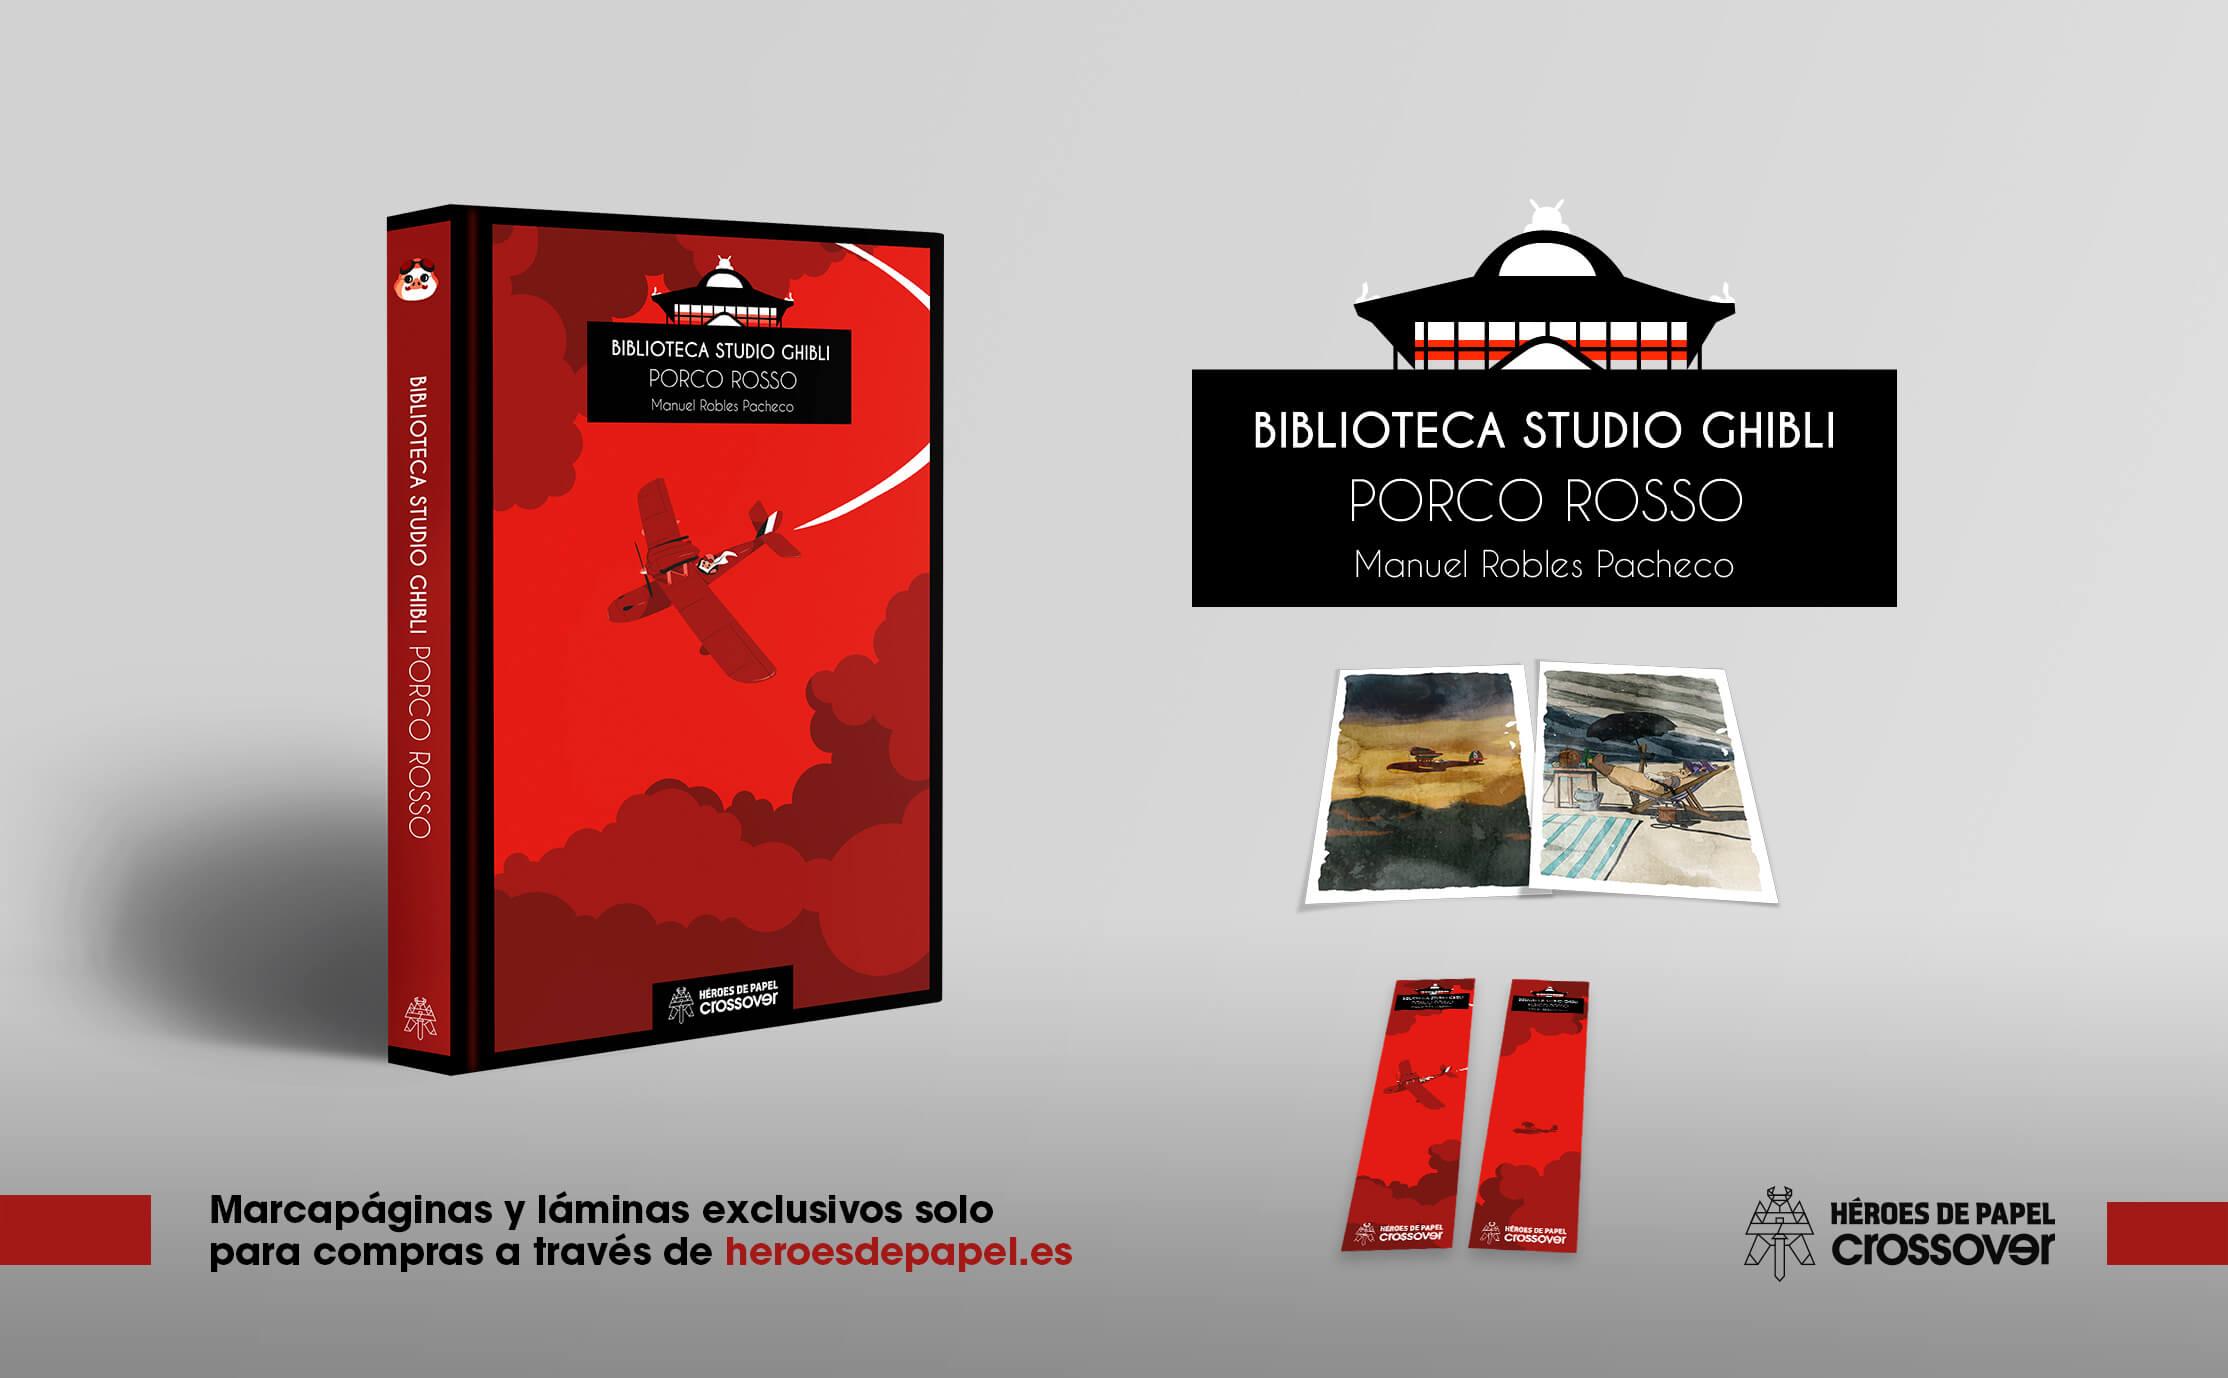 Biblioteca Studio Ghibli: Porco Rosso marcapáginas